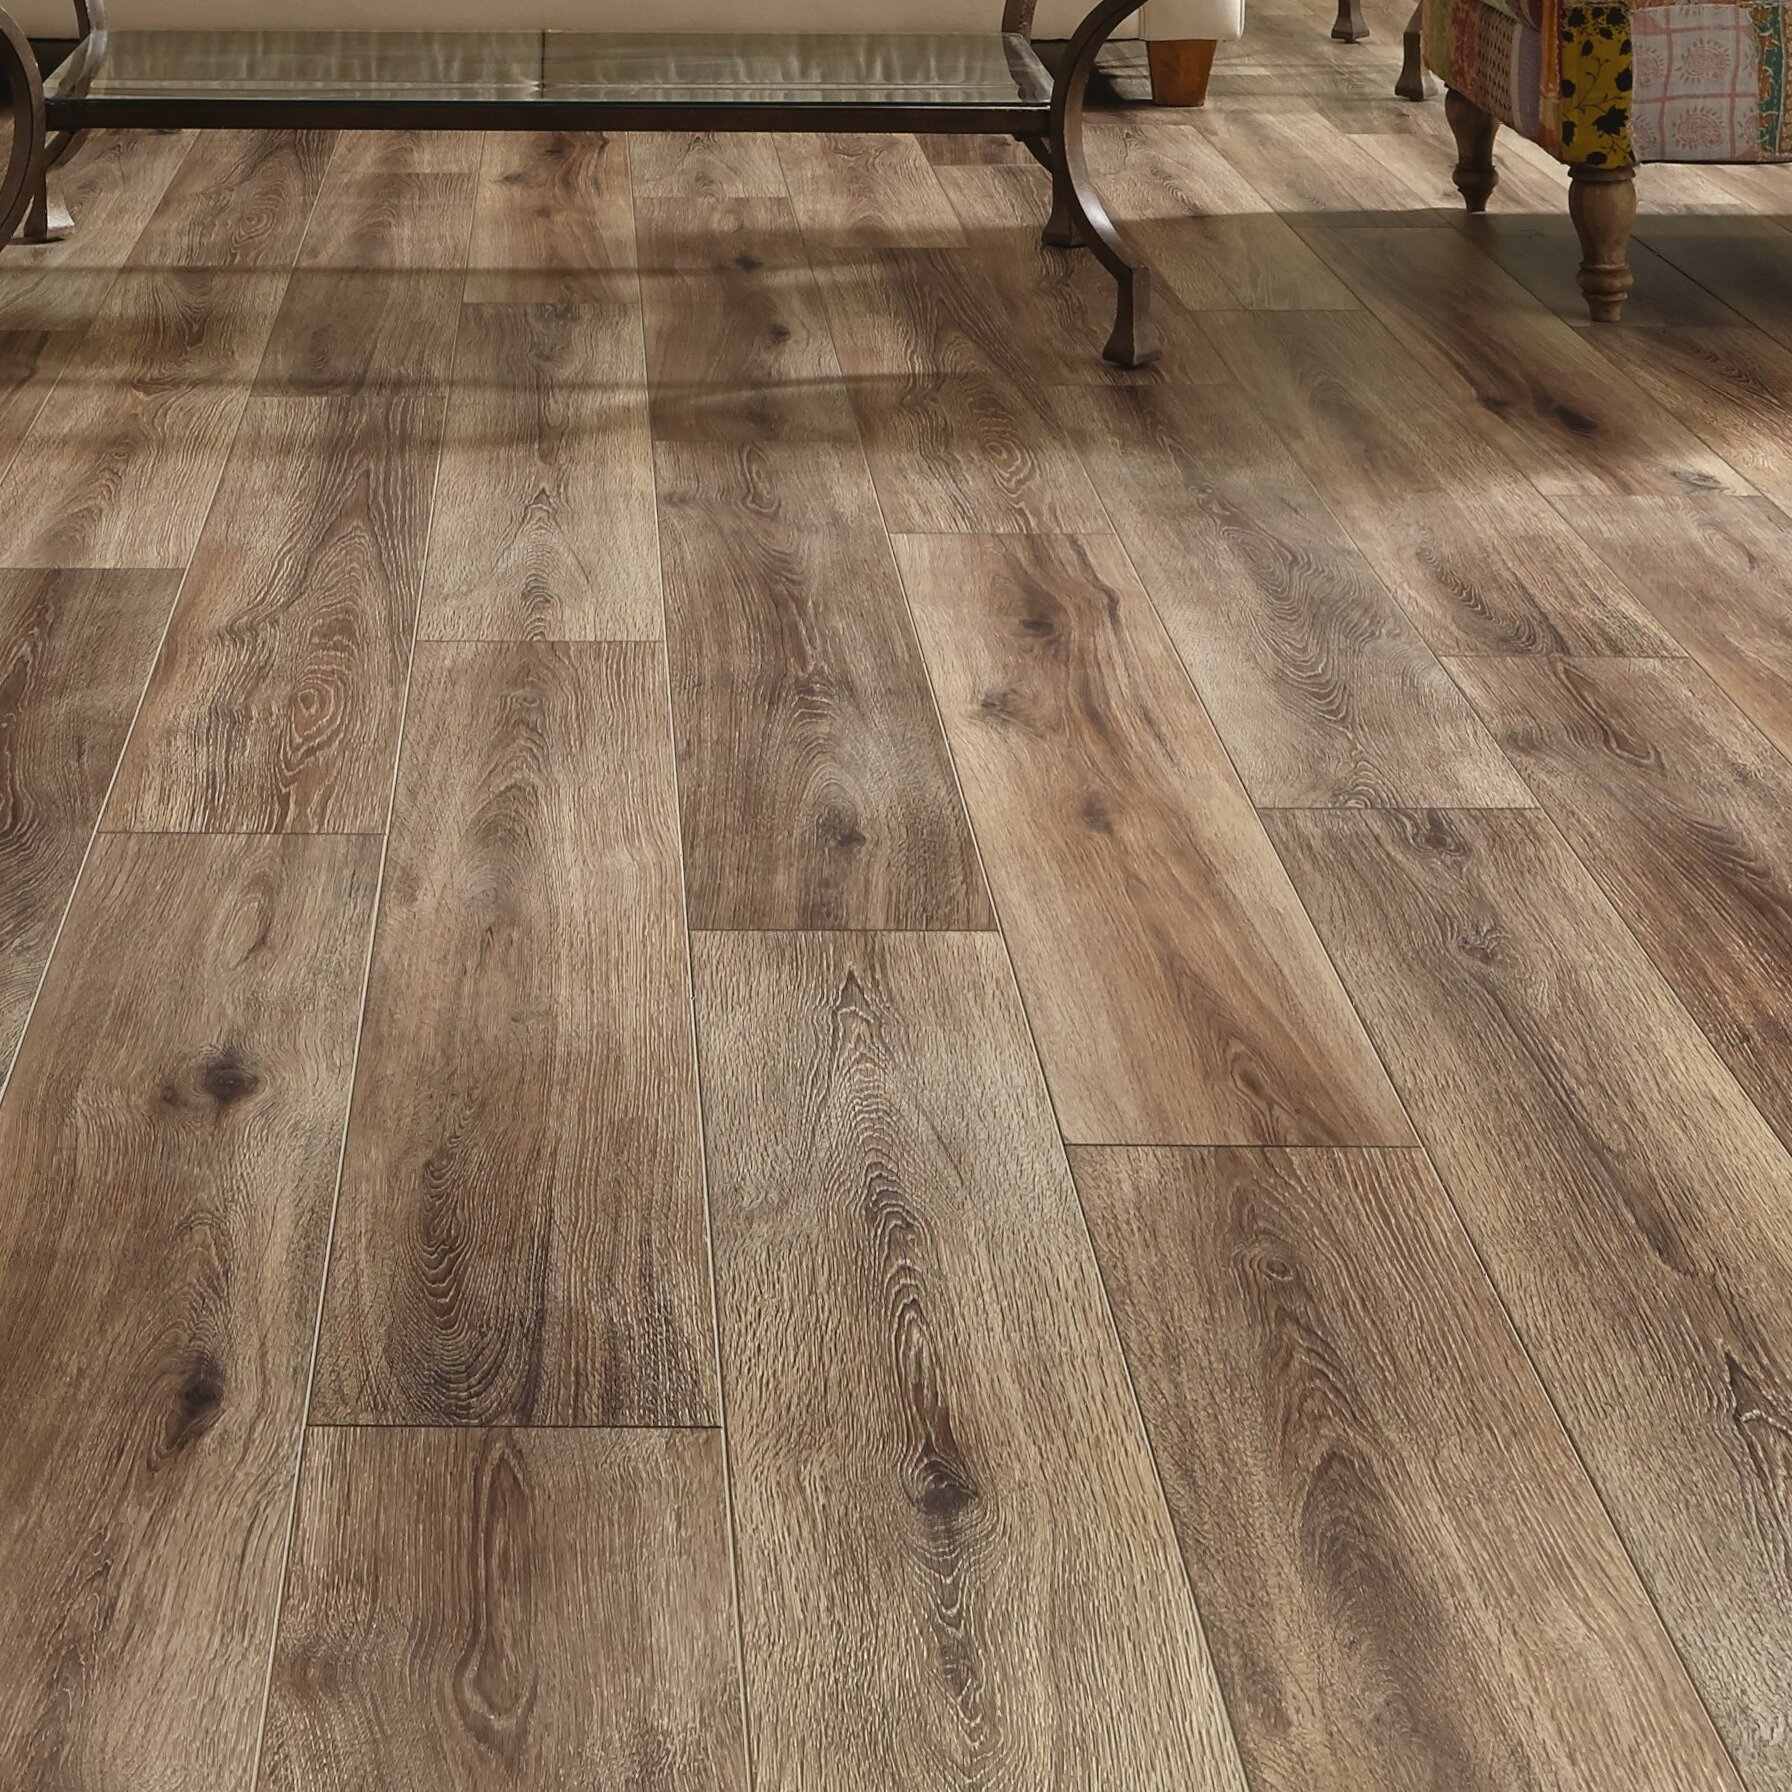 Beau Black Laminate Wood Flooring | Wayfair